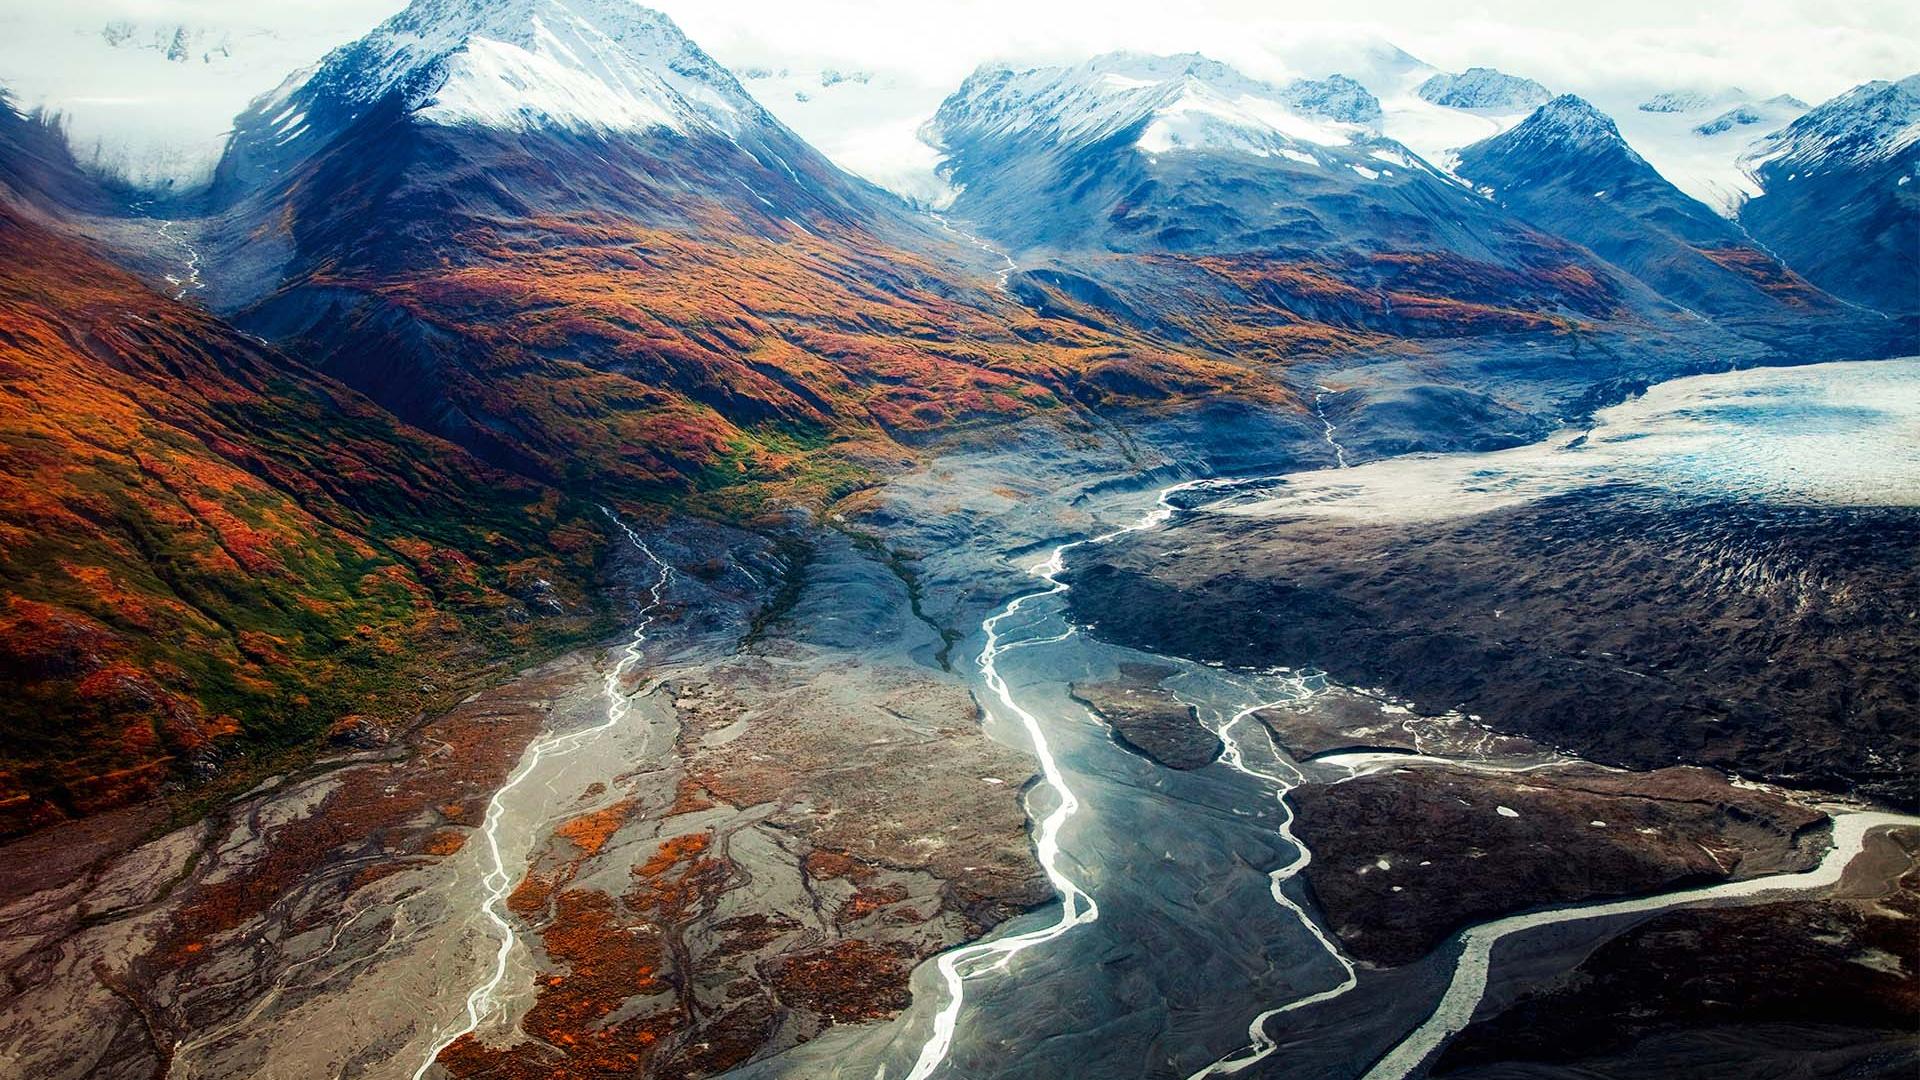 Aerial view Canada Kluane National Park mountain